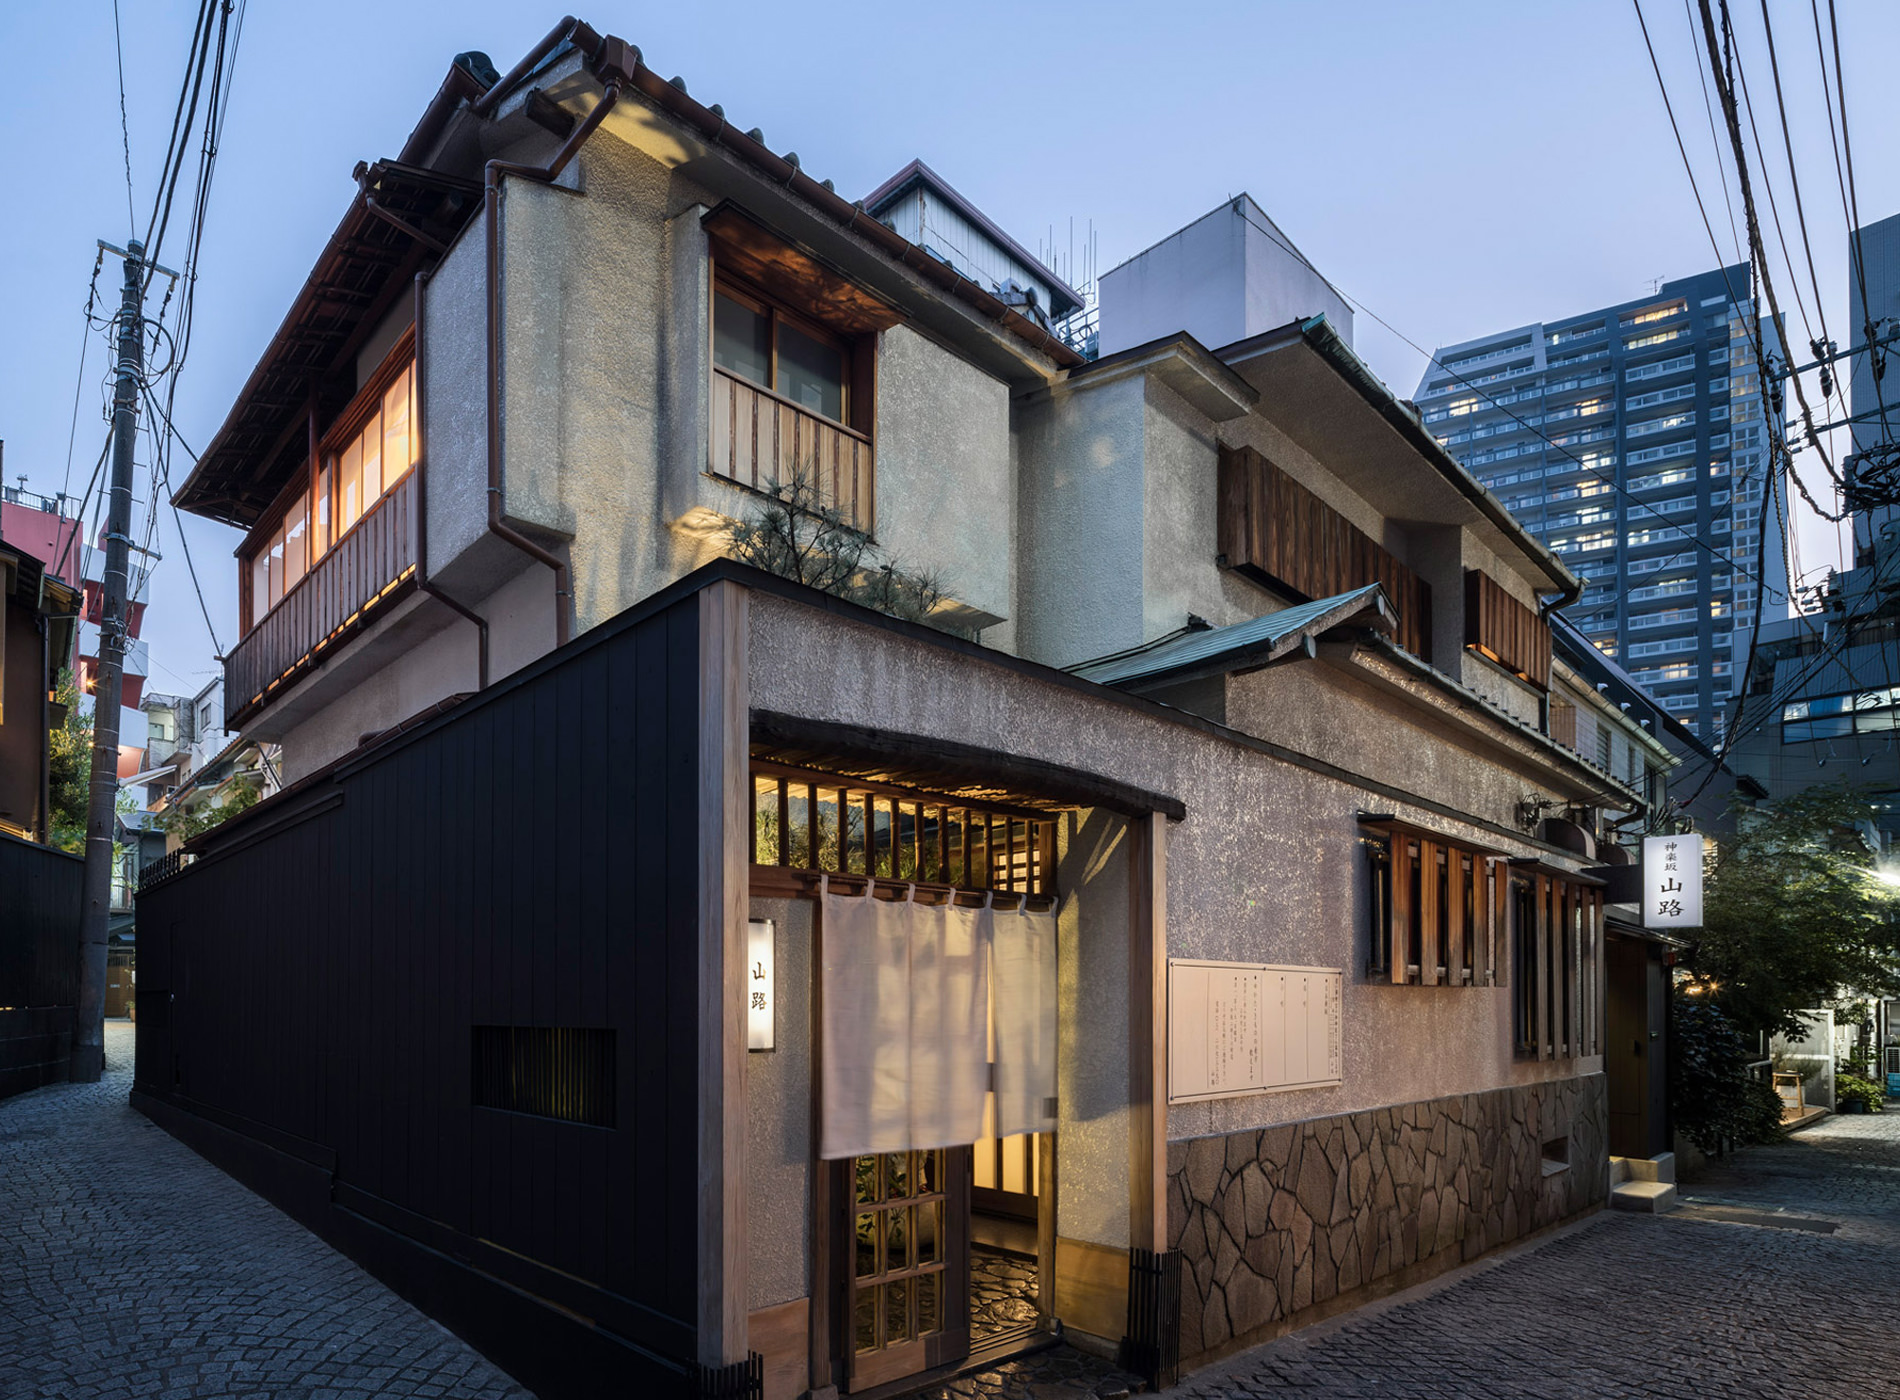 City Guide Tokyo Kagurazaka Trunk House Architecture